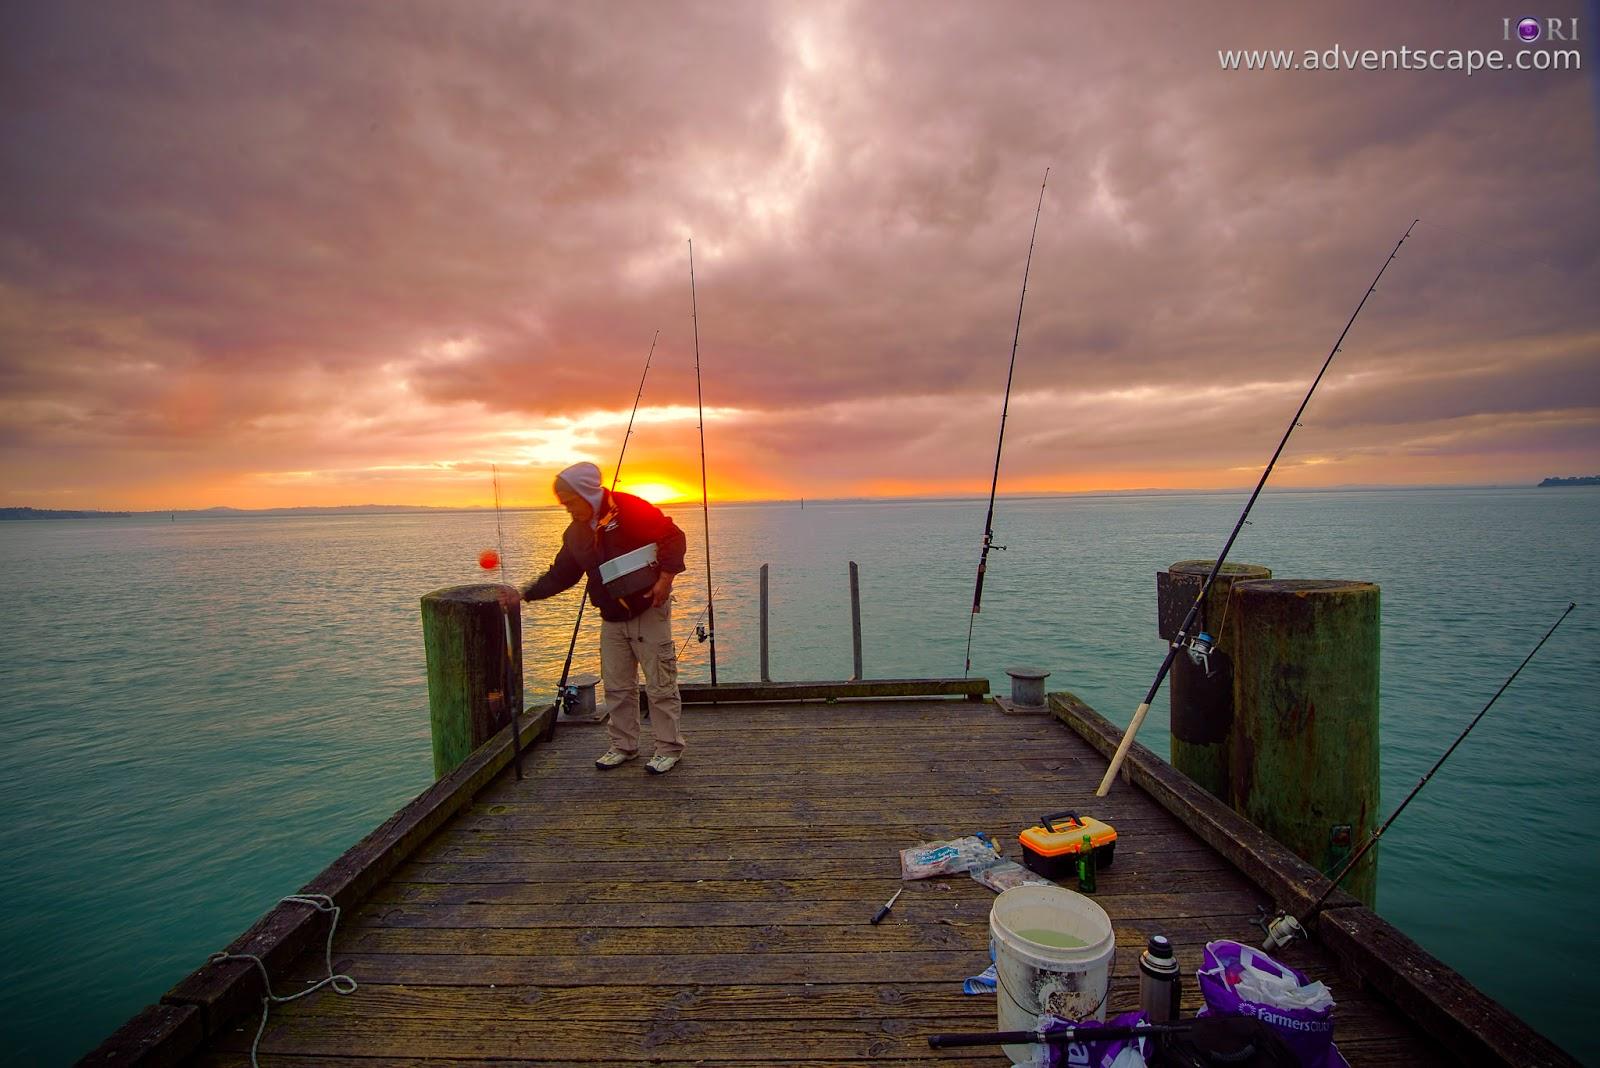 Philip Avellana, iori, adventscape, Cornwallis, jetty, seascape, landscape, North Island, New Zealand, fine art, sunrise, fisherman, fishing rod